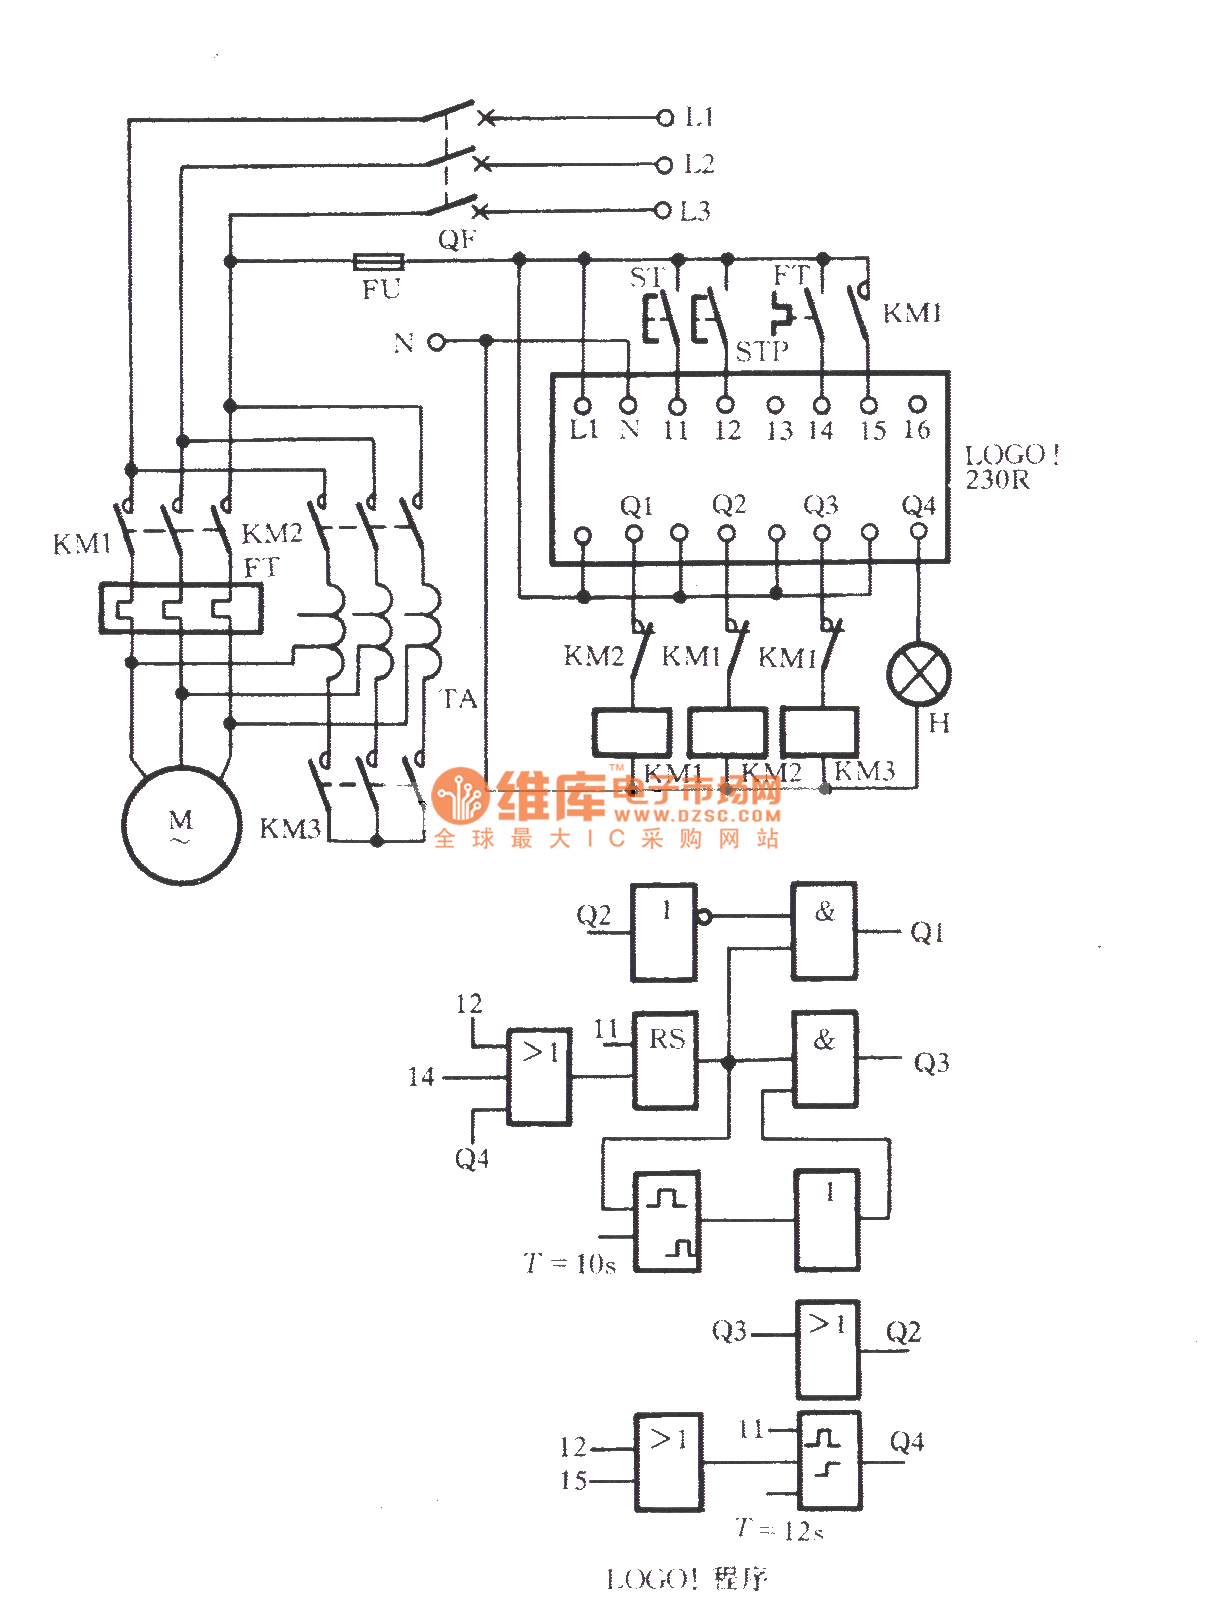 Auto Transformer Starter Circuit Diagram - Roslonek.net